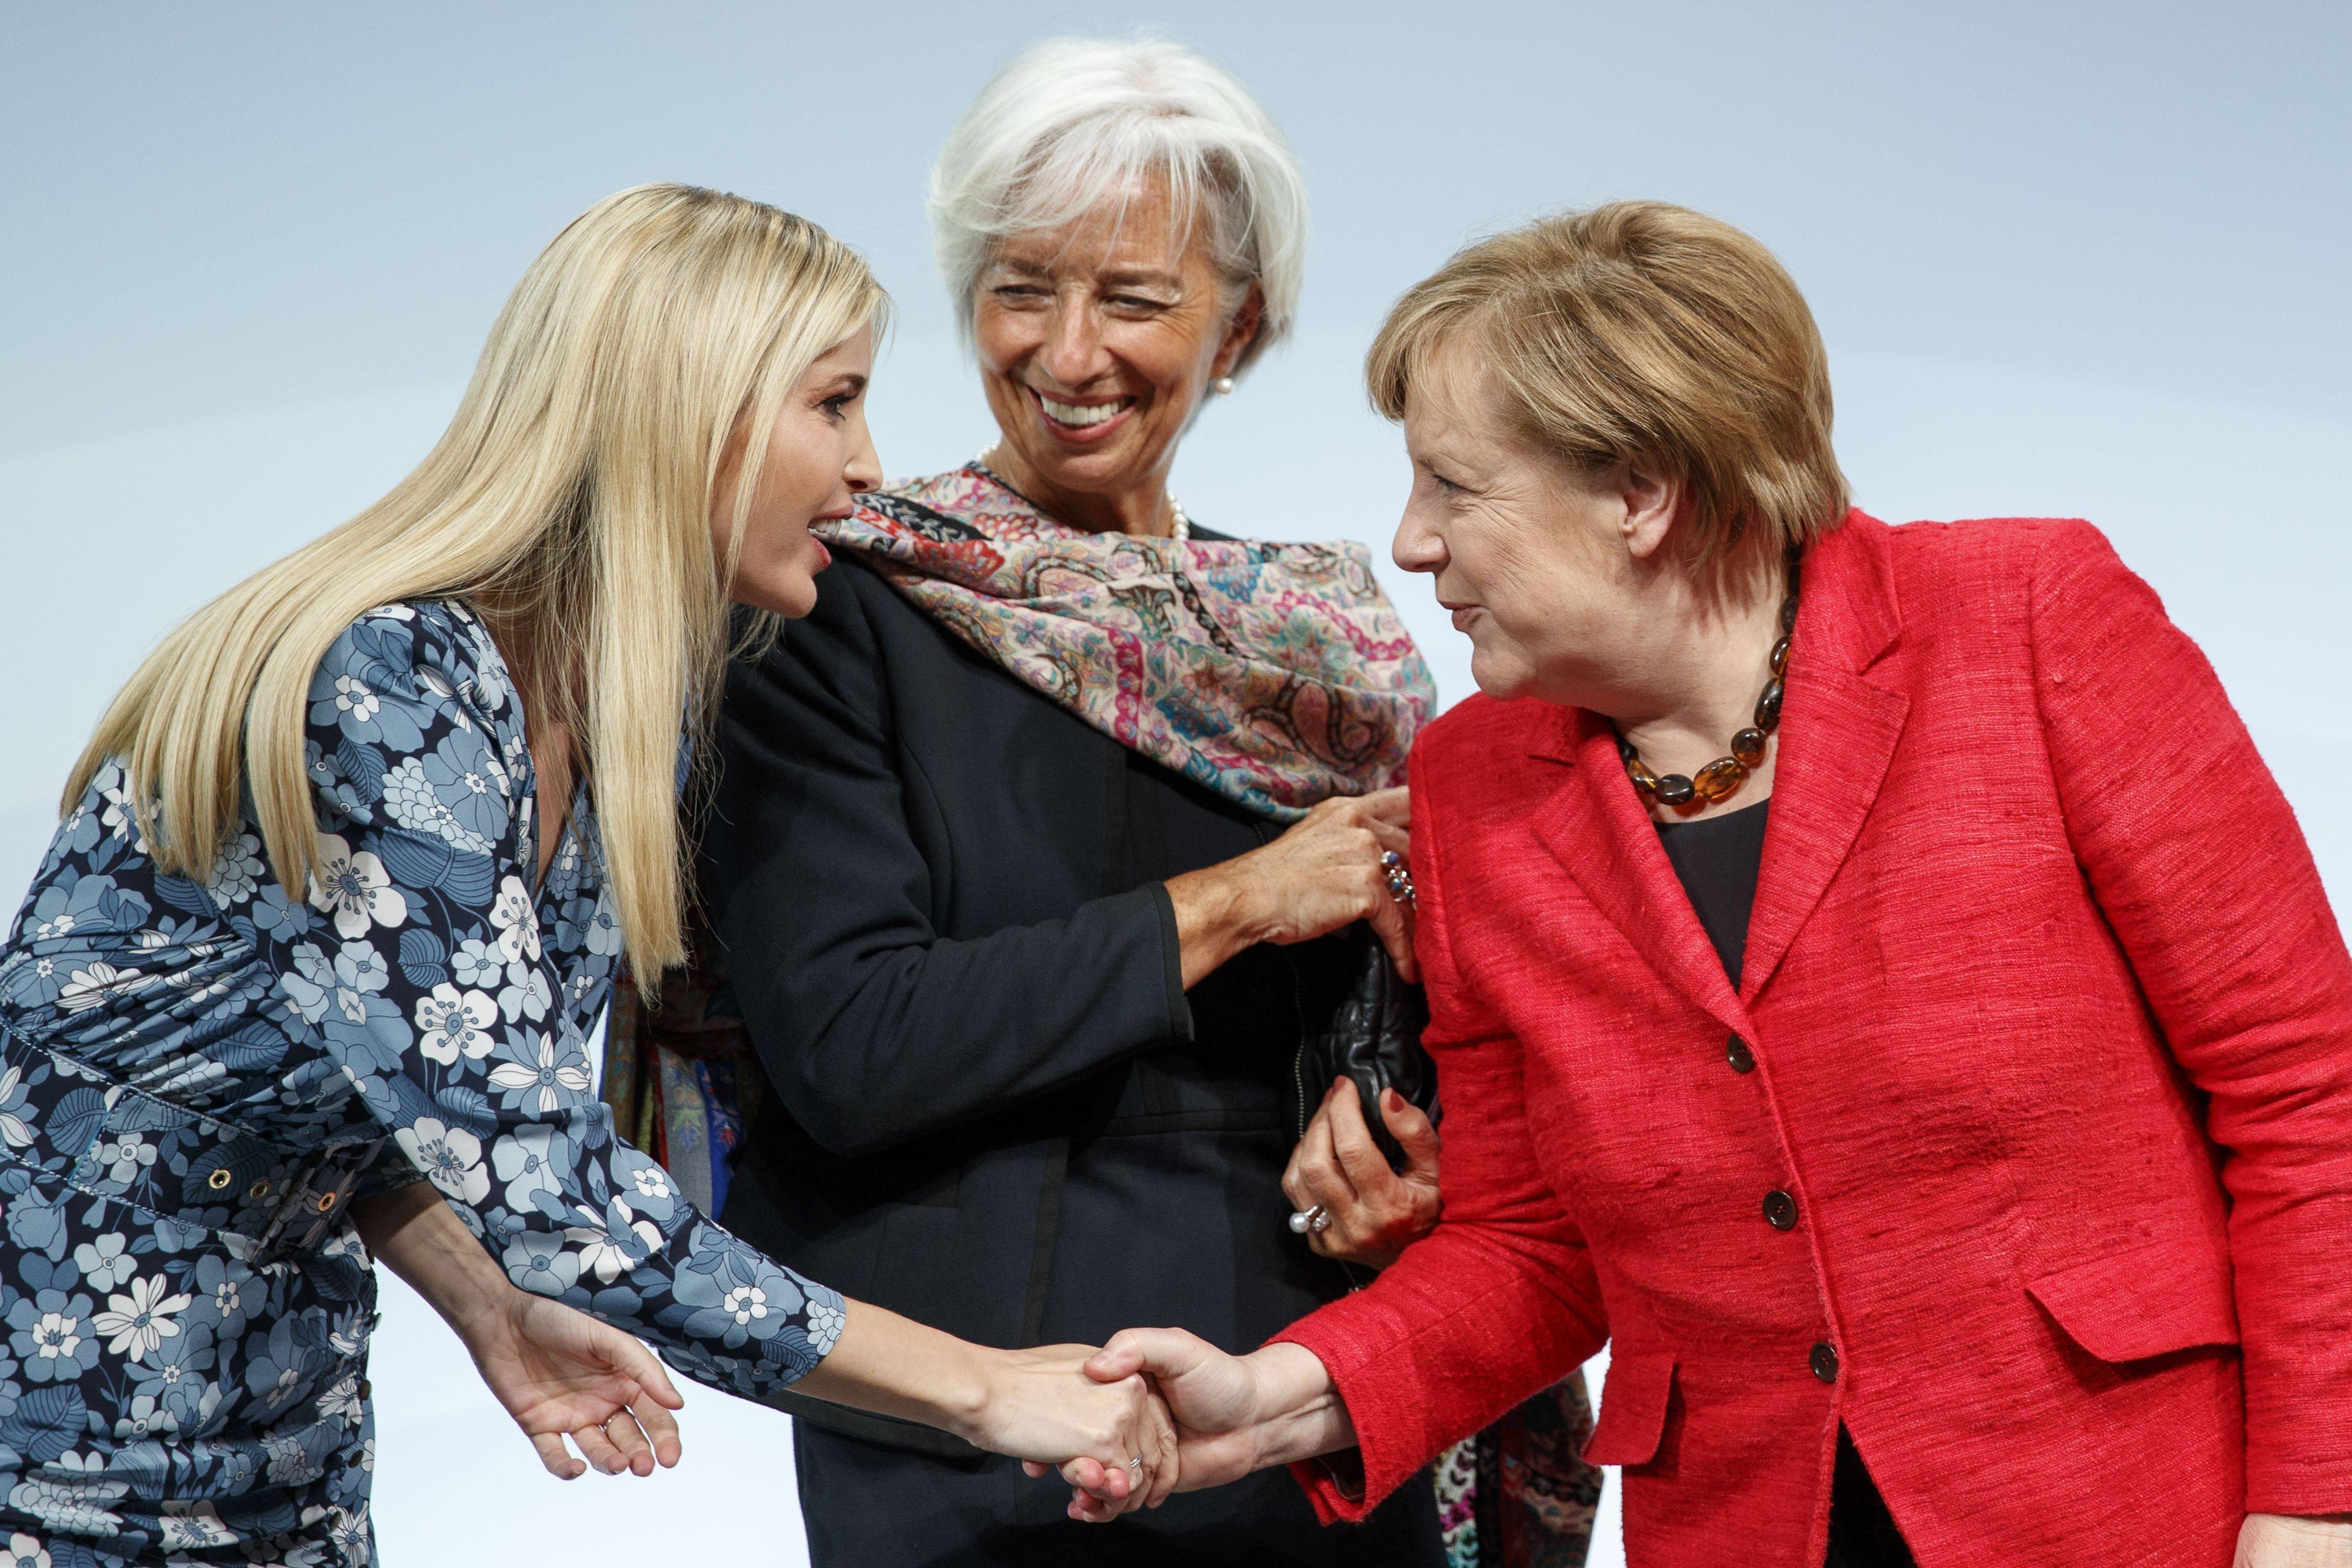 Ivanka Trump, Angela Merkel, i la directora del Fons Monetari Internacional, Christine Lagarde, durant el Woman20 (W20) a Berlín (Alemanya). EFE/ CARSTEN KOALL